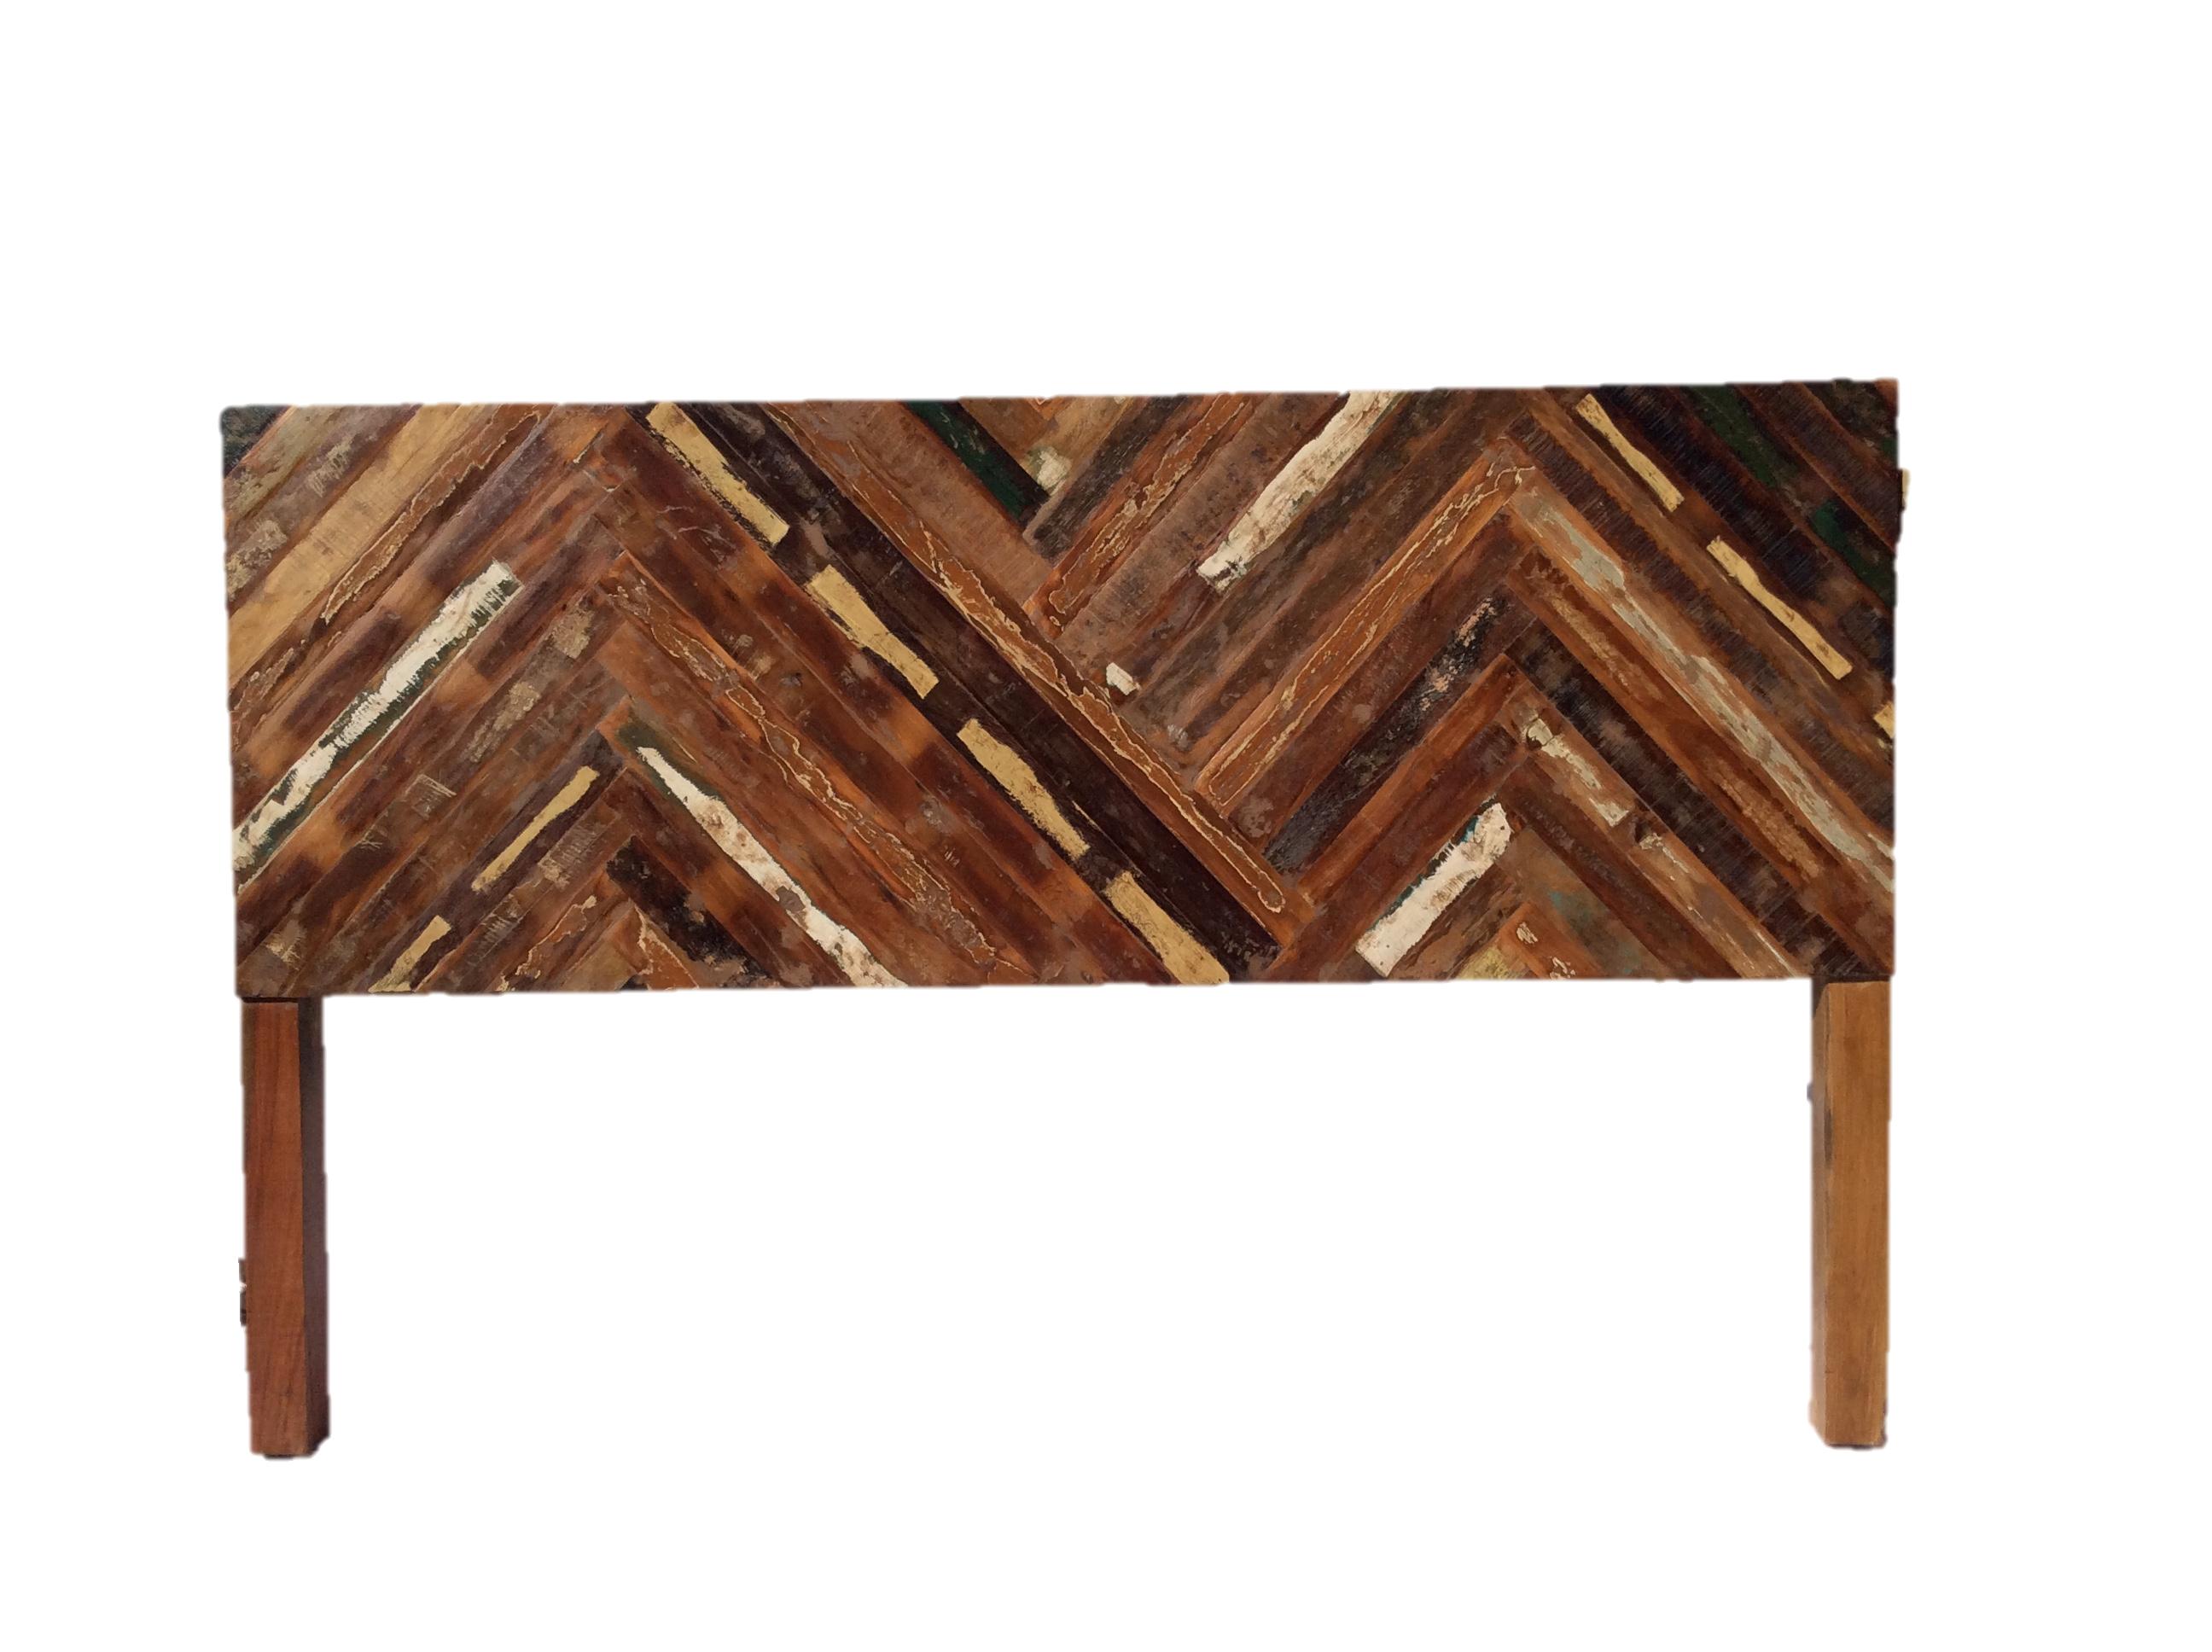 Rustic Reclaimed Wood Cal King Headboard